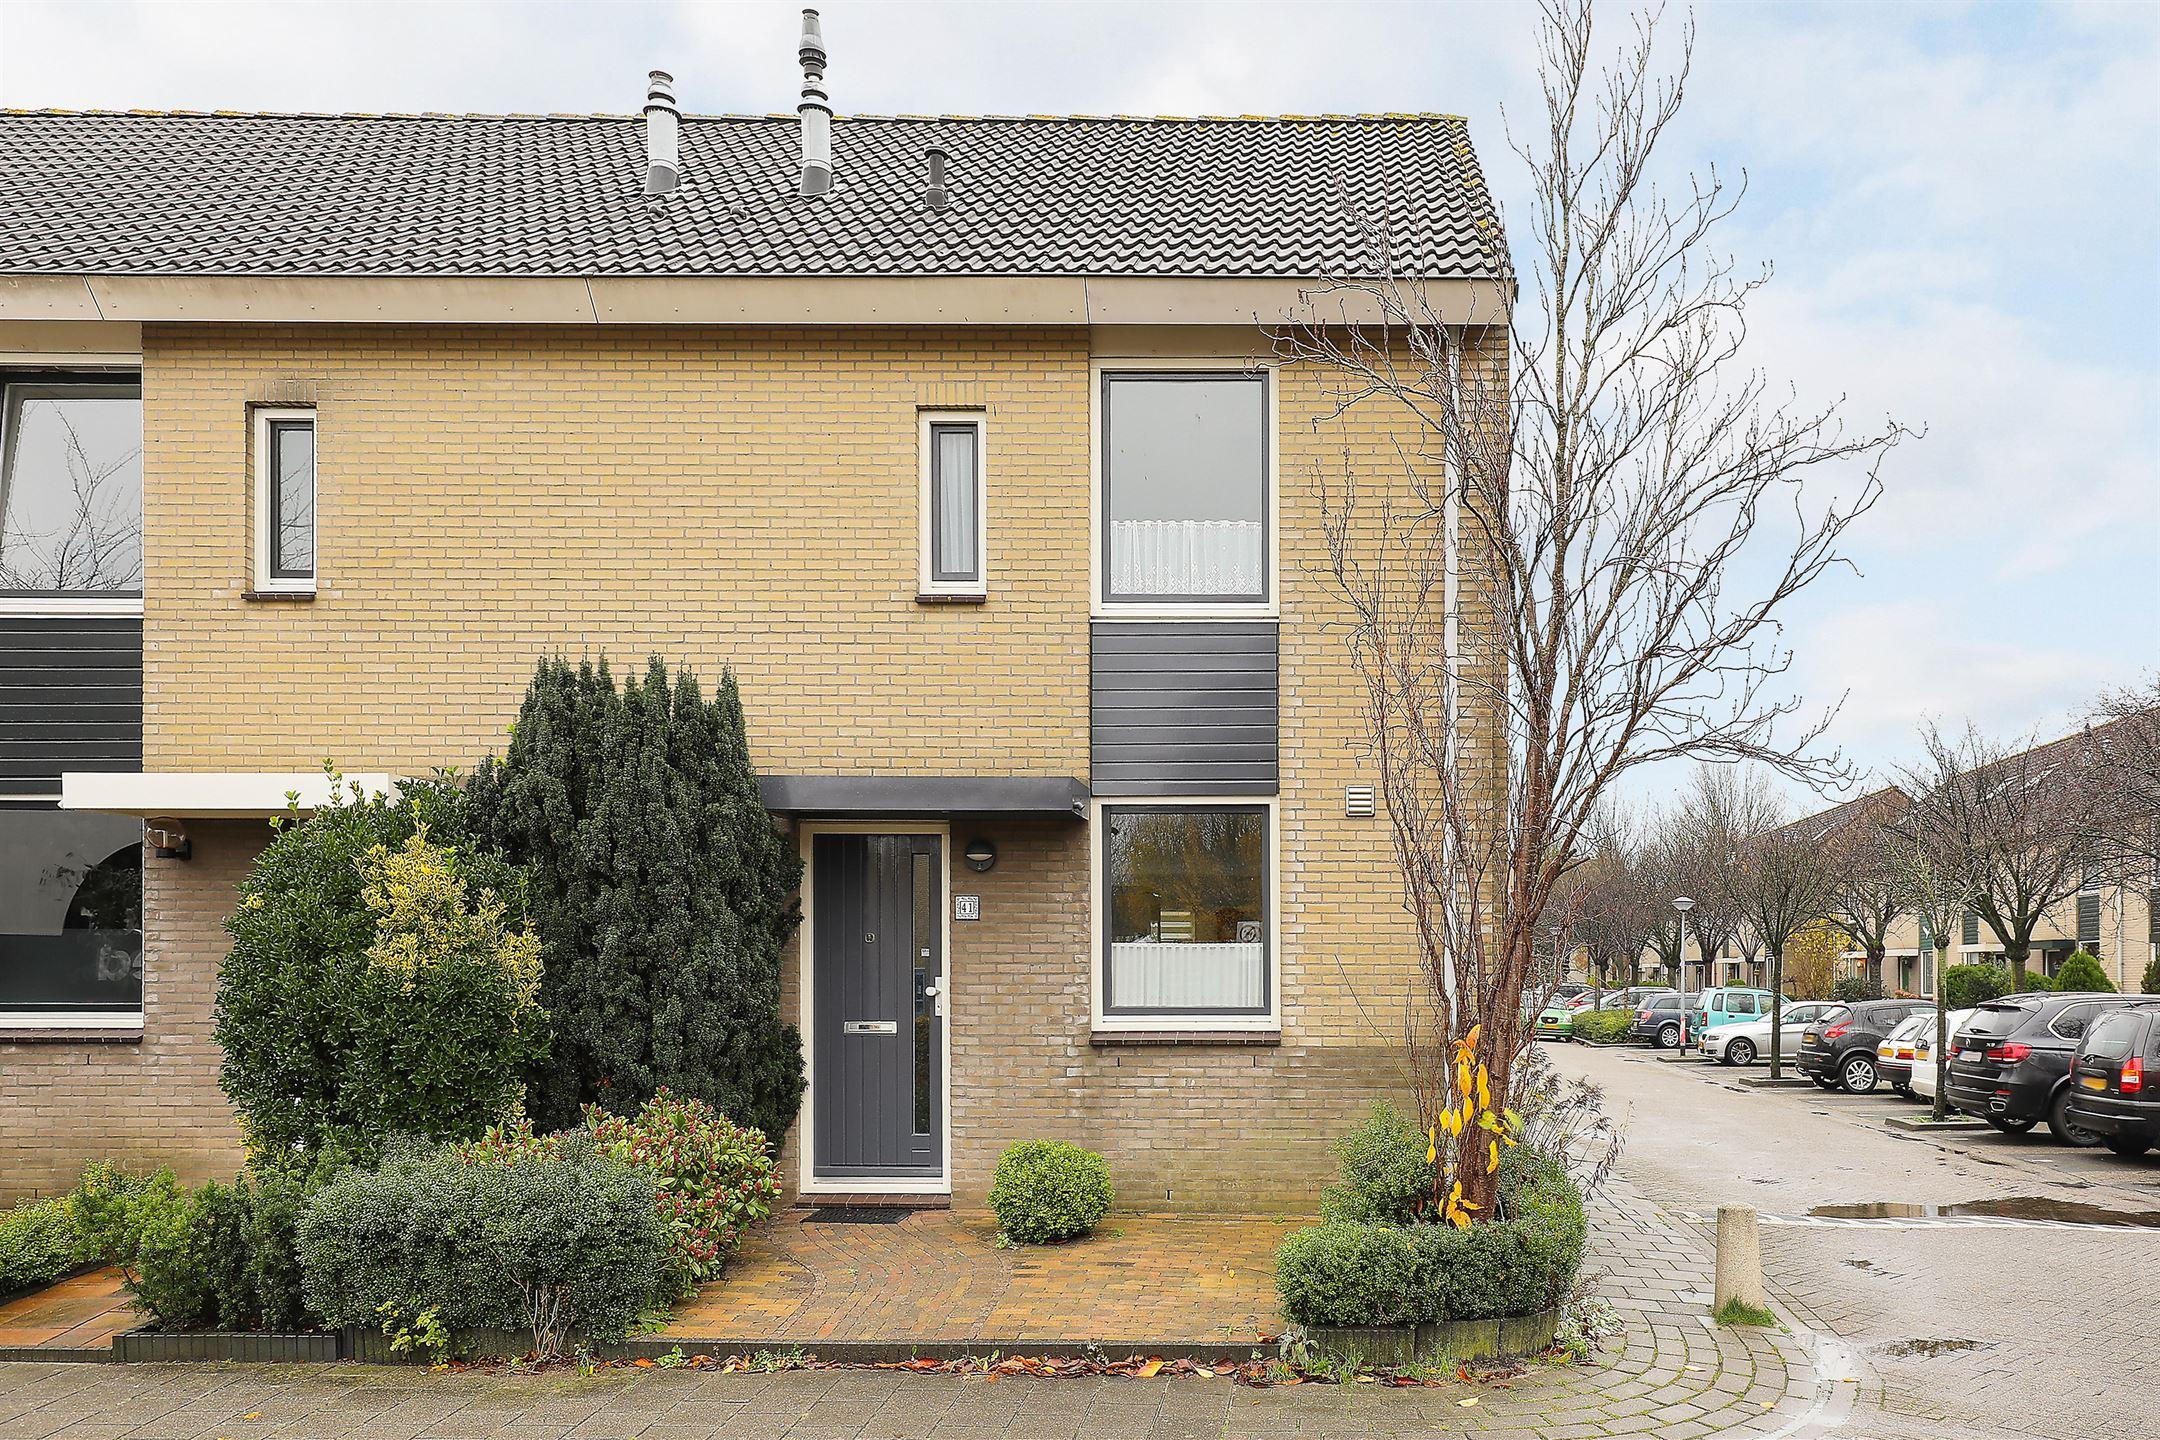 Complete Badkamer Almere : Verkocht markiezenhofstraat tn almere funda